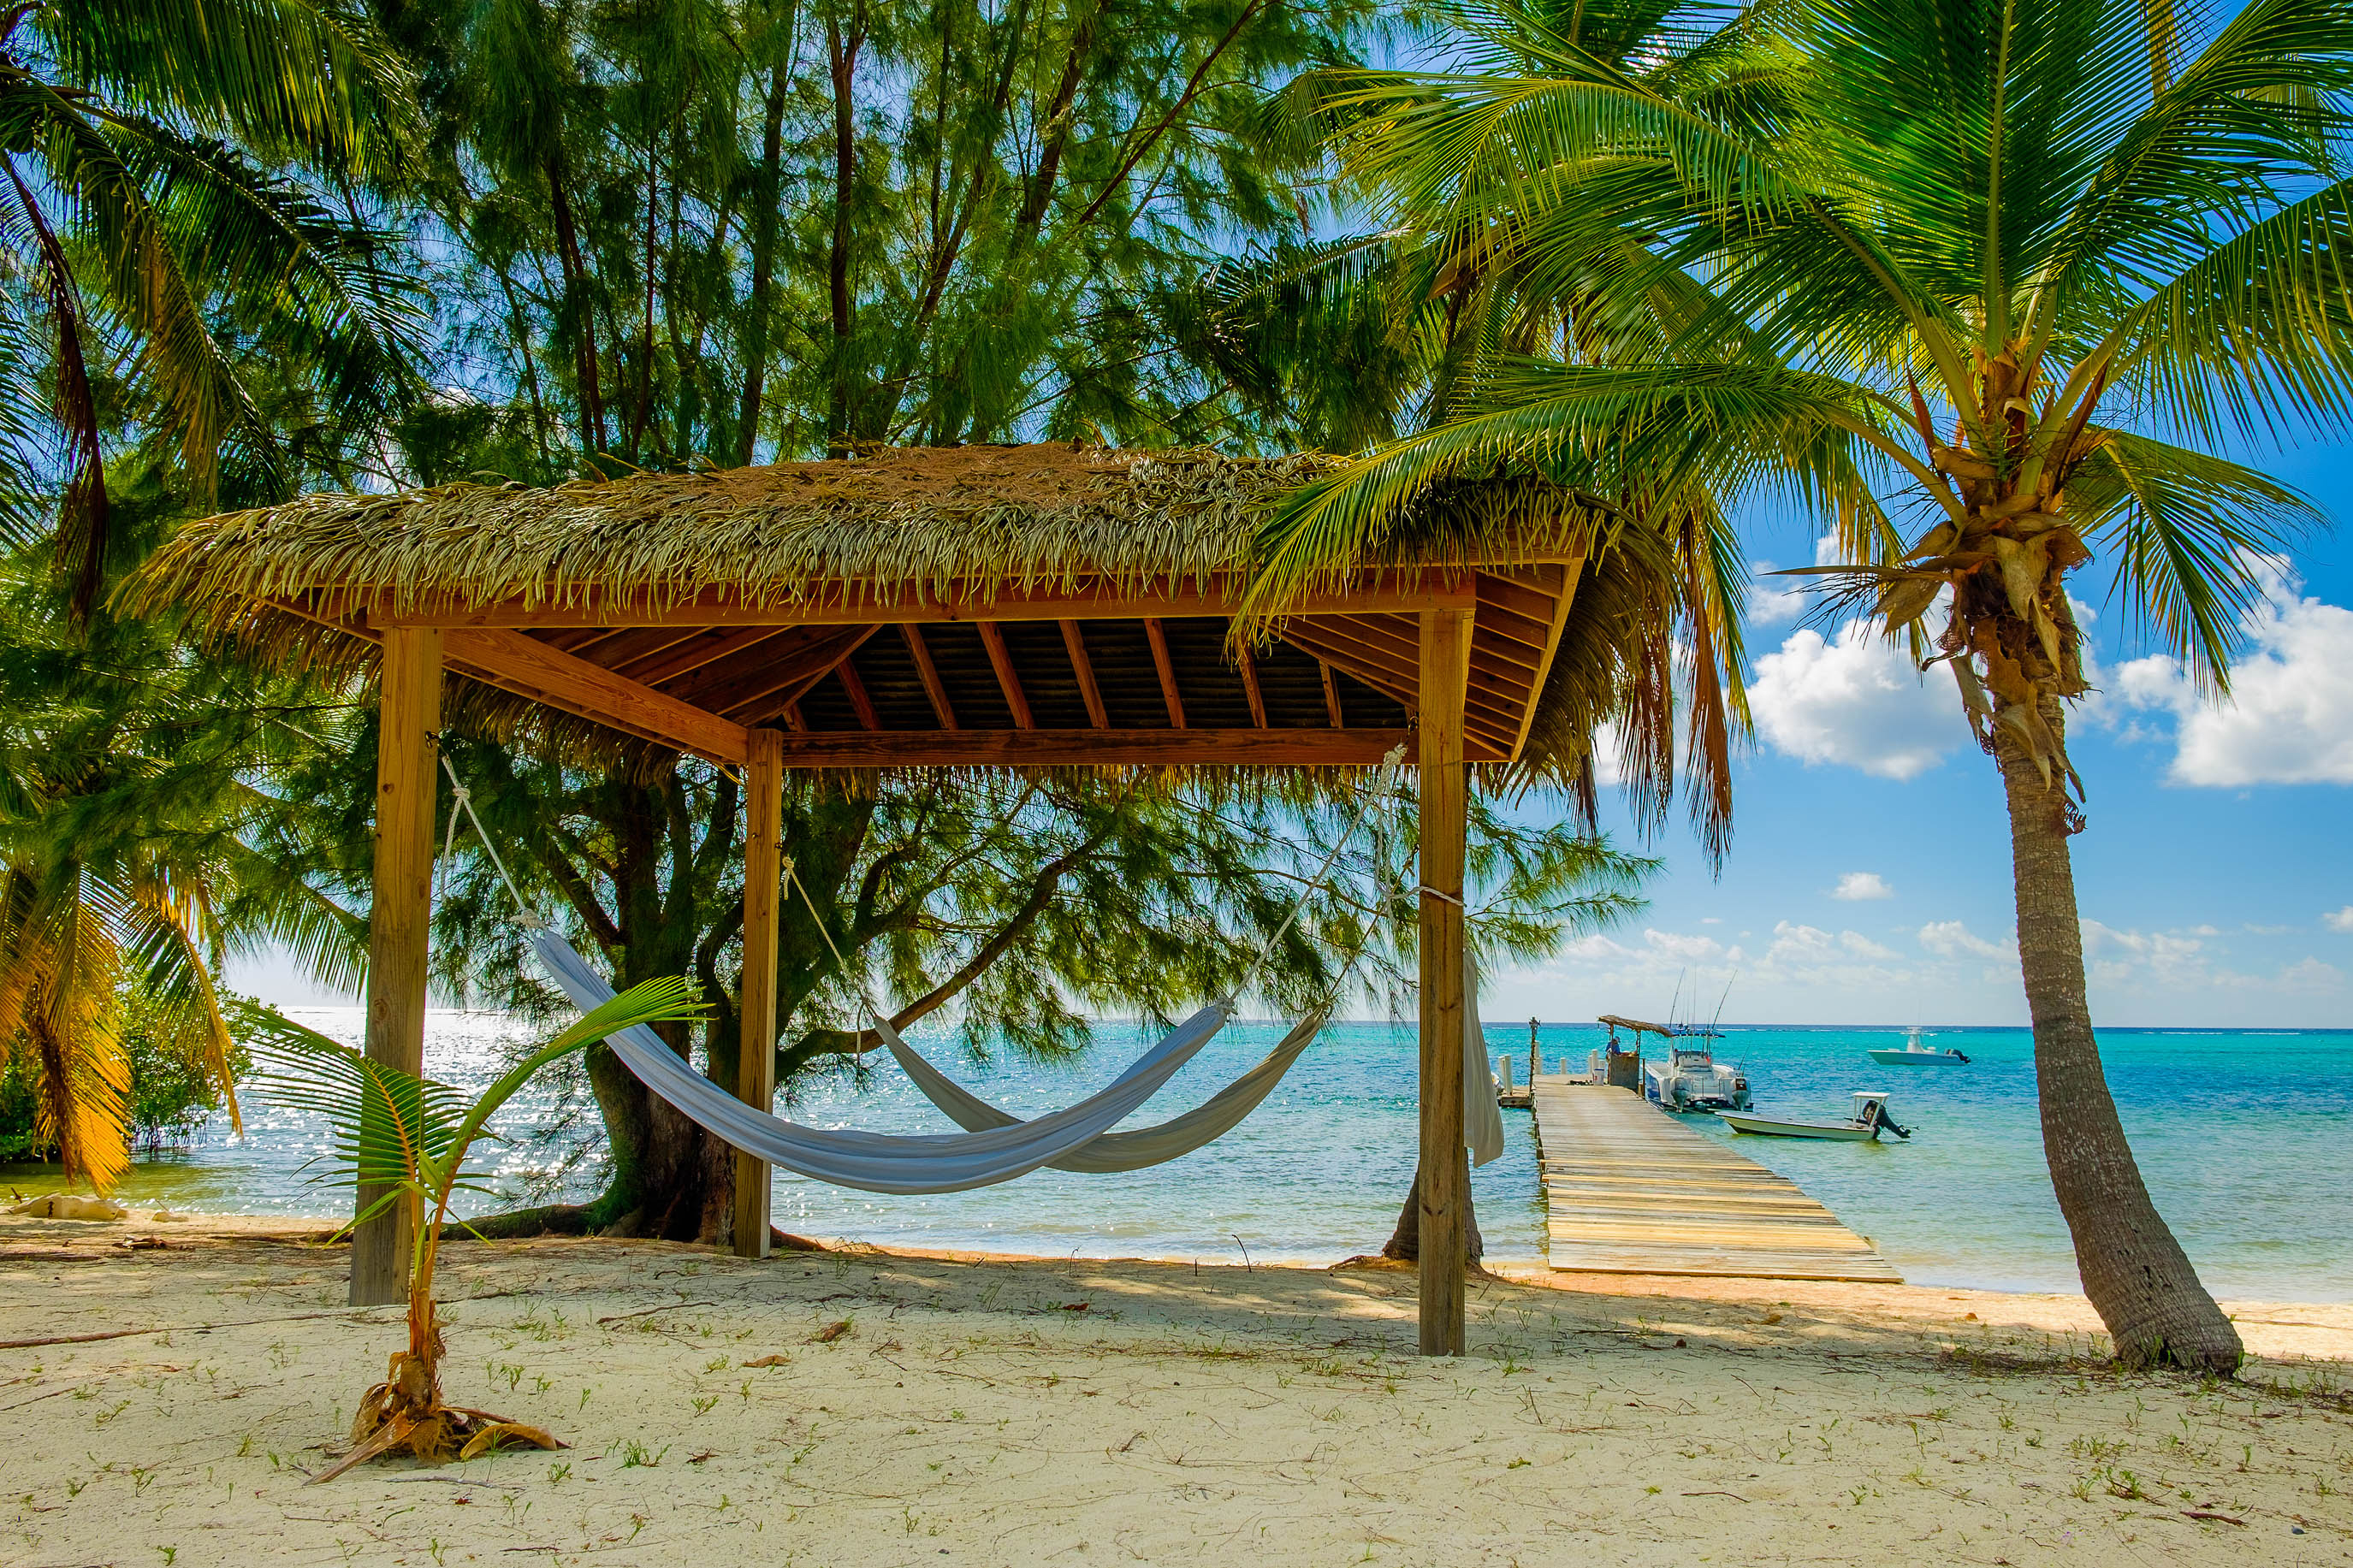 Cayman Brac & Little Cayman